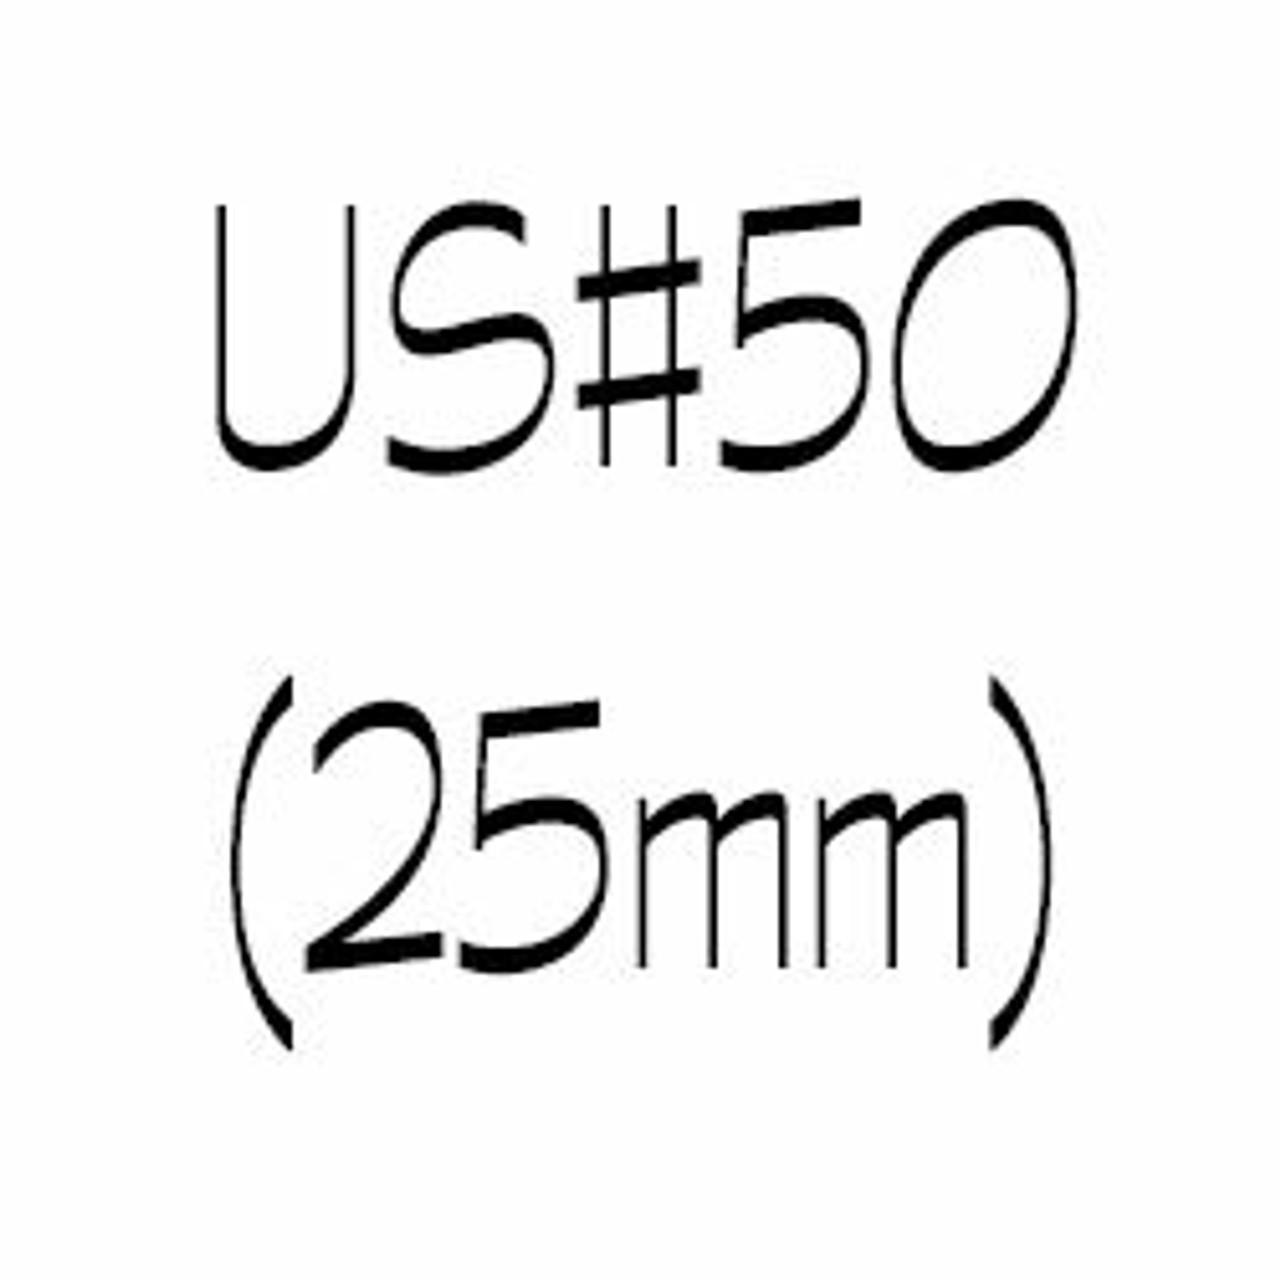 US#50 (25mm) Circular Knitting Needles